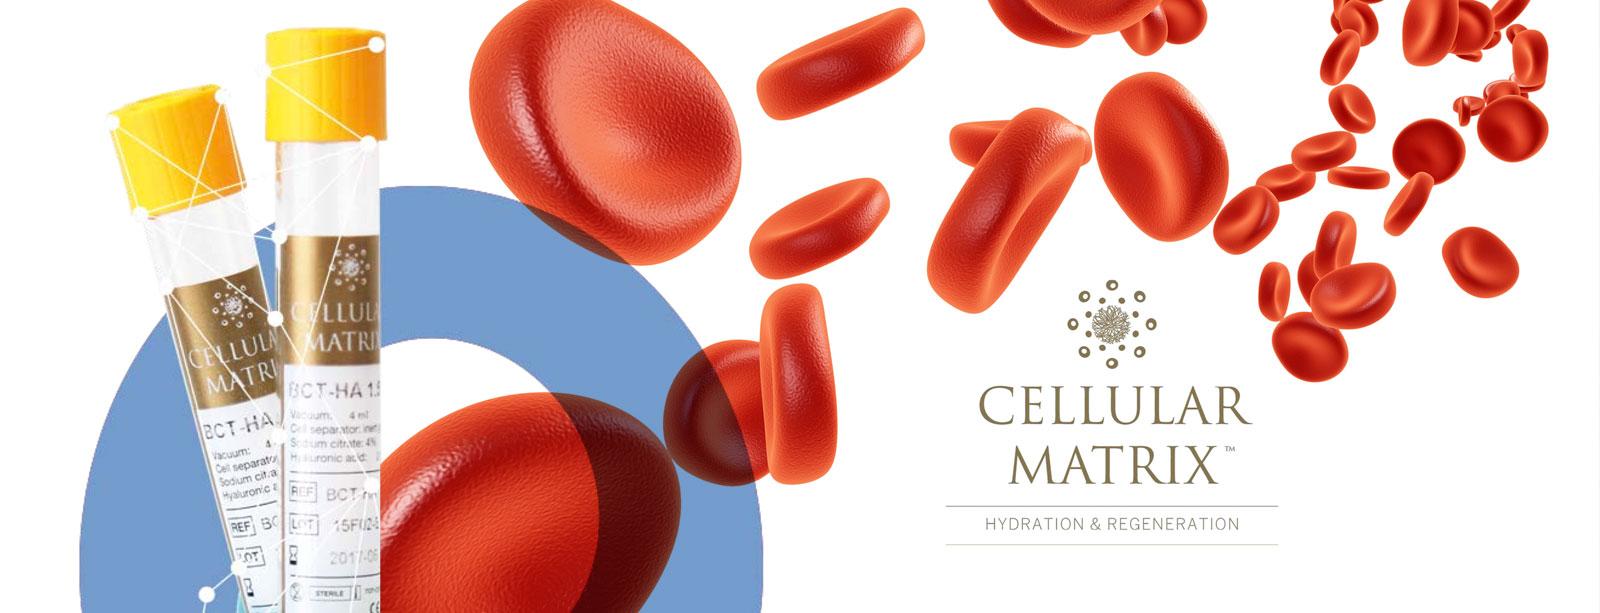 cellularMatrix.jpg